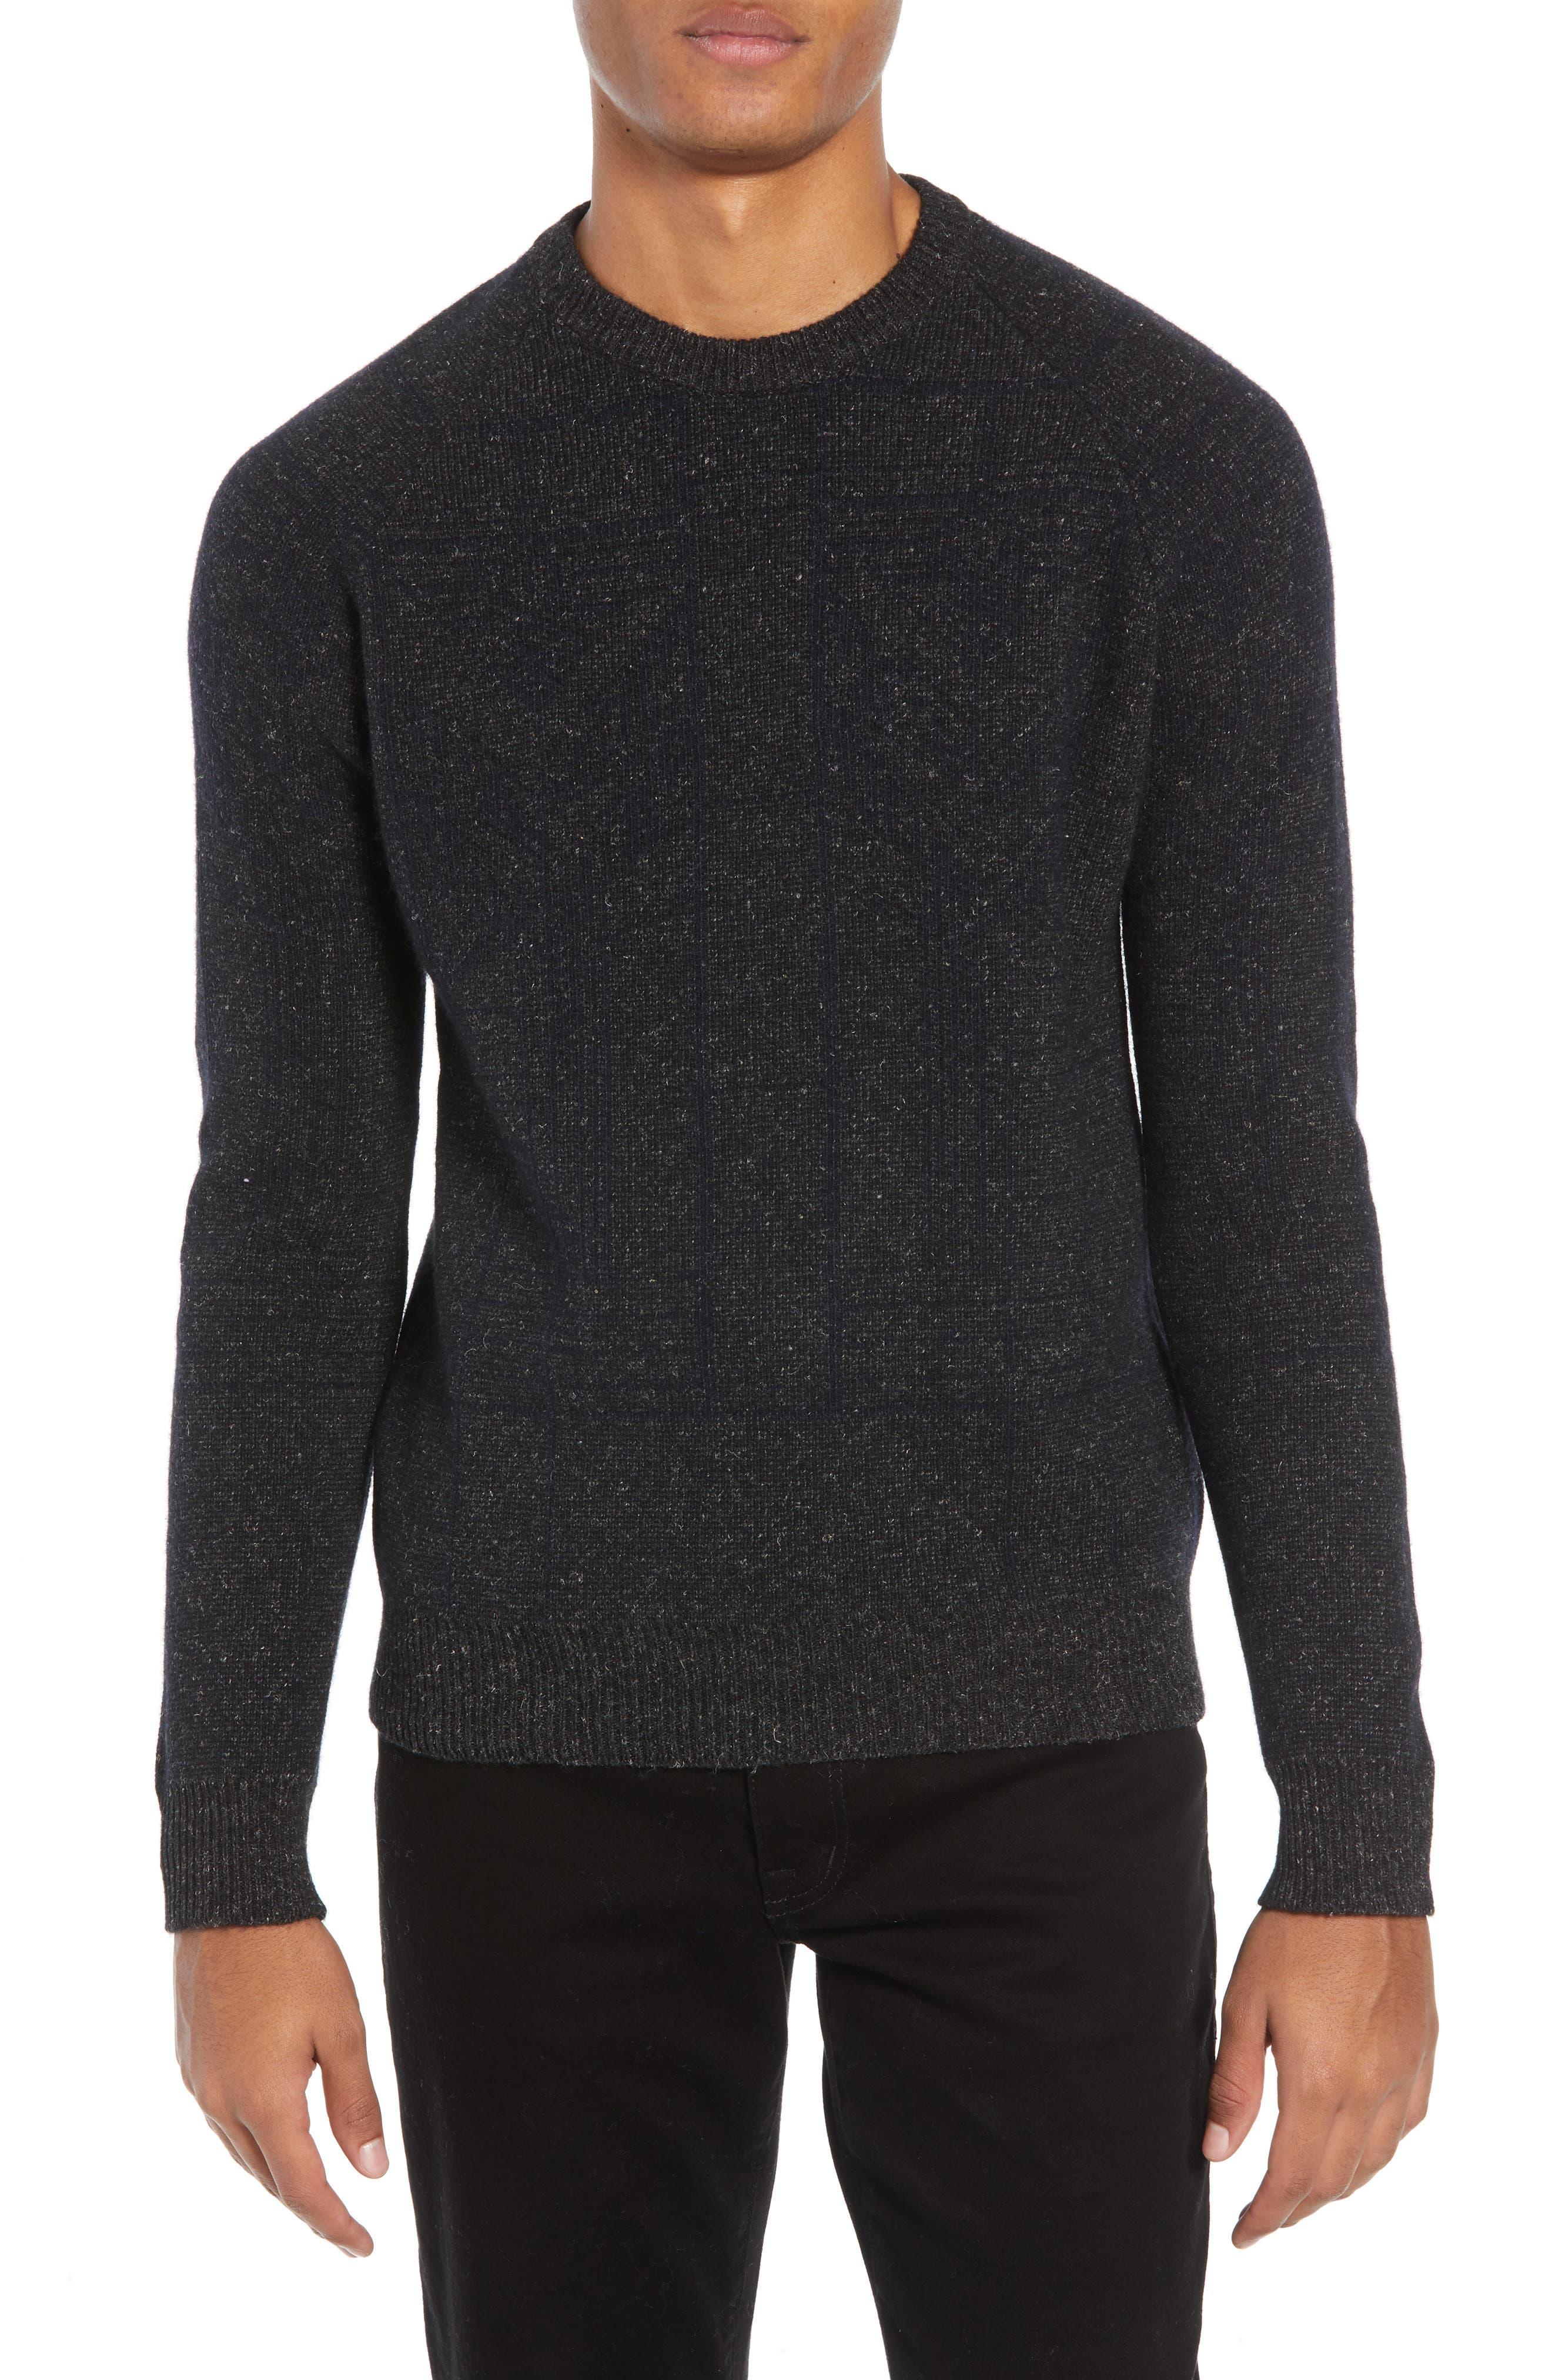 Regular Fit Crewneck Sweater,                             Main thumbnail 1, color,                             CHARCOAL